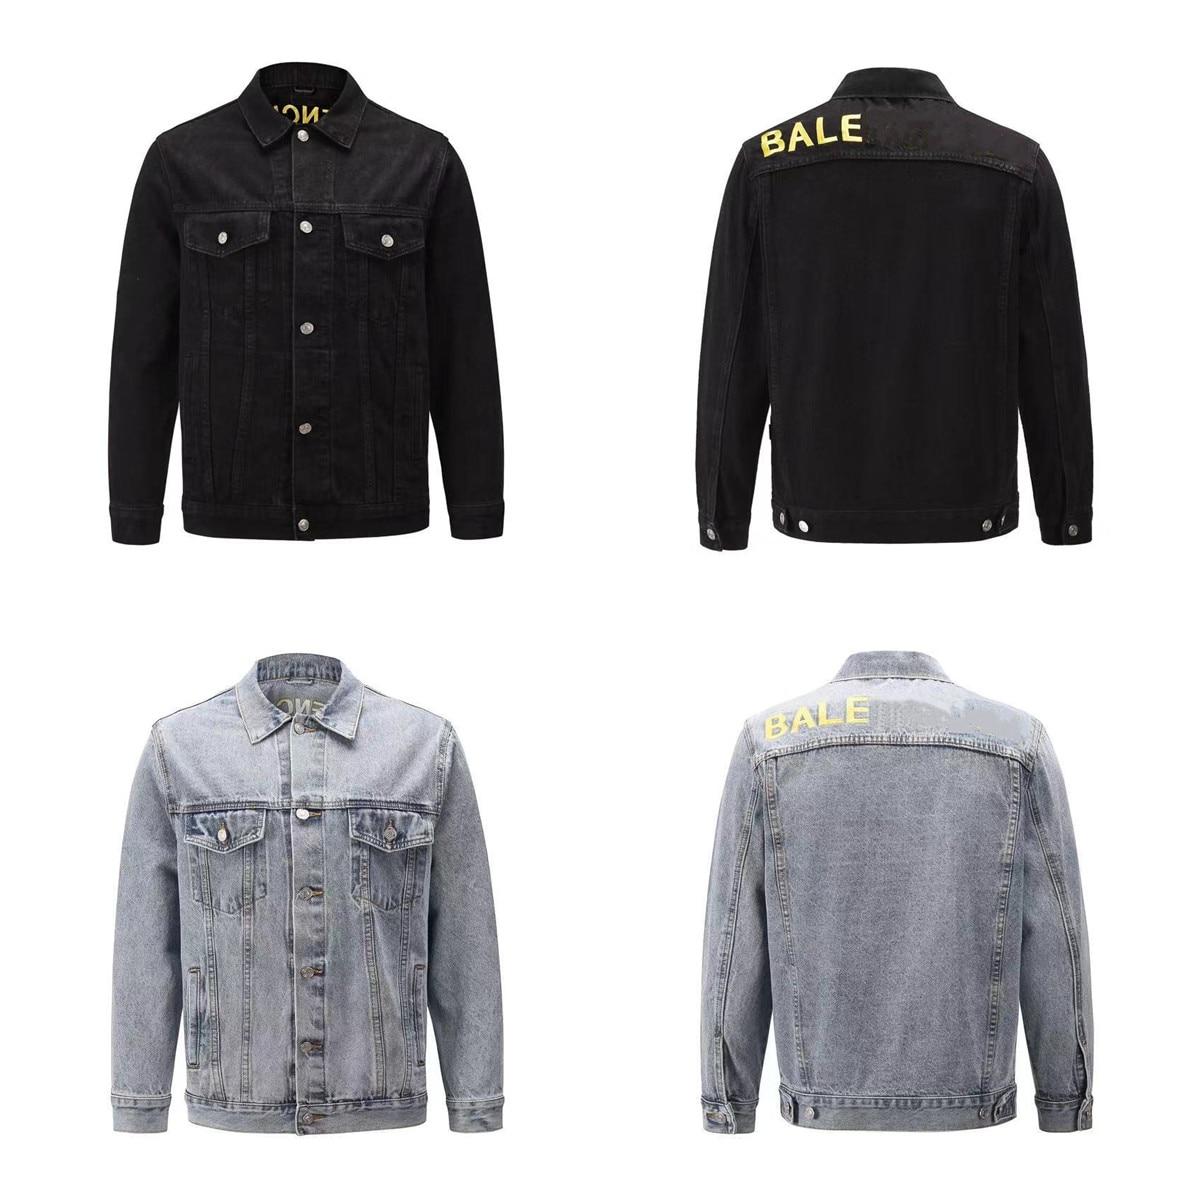 2021 Paris Spring and summer Fashion Hip Hop Denim Jacket Male Cowboy Ripped Hole European Size S~XL 64